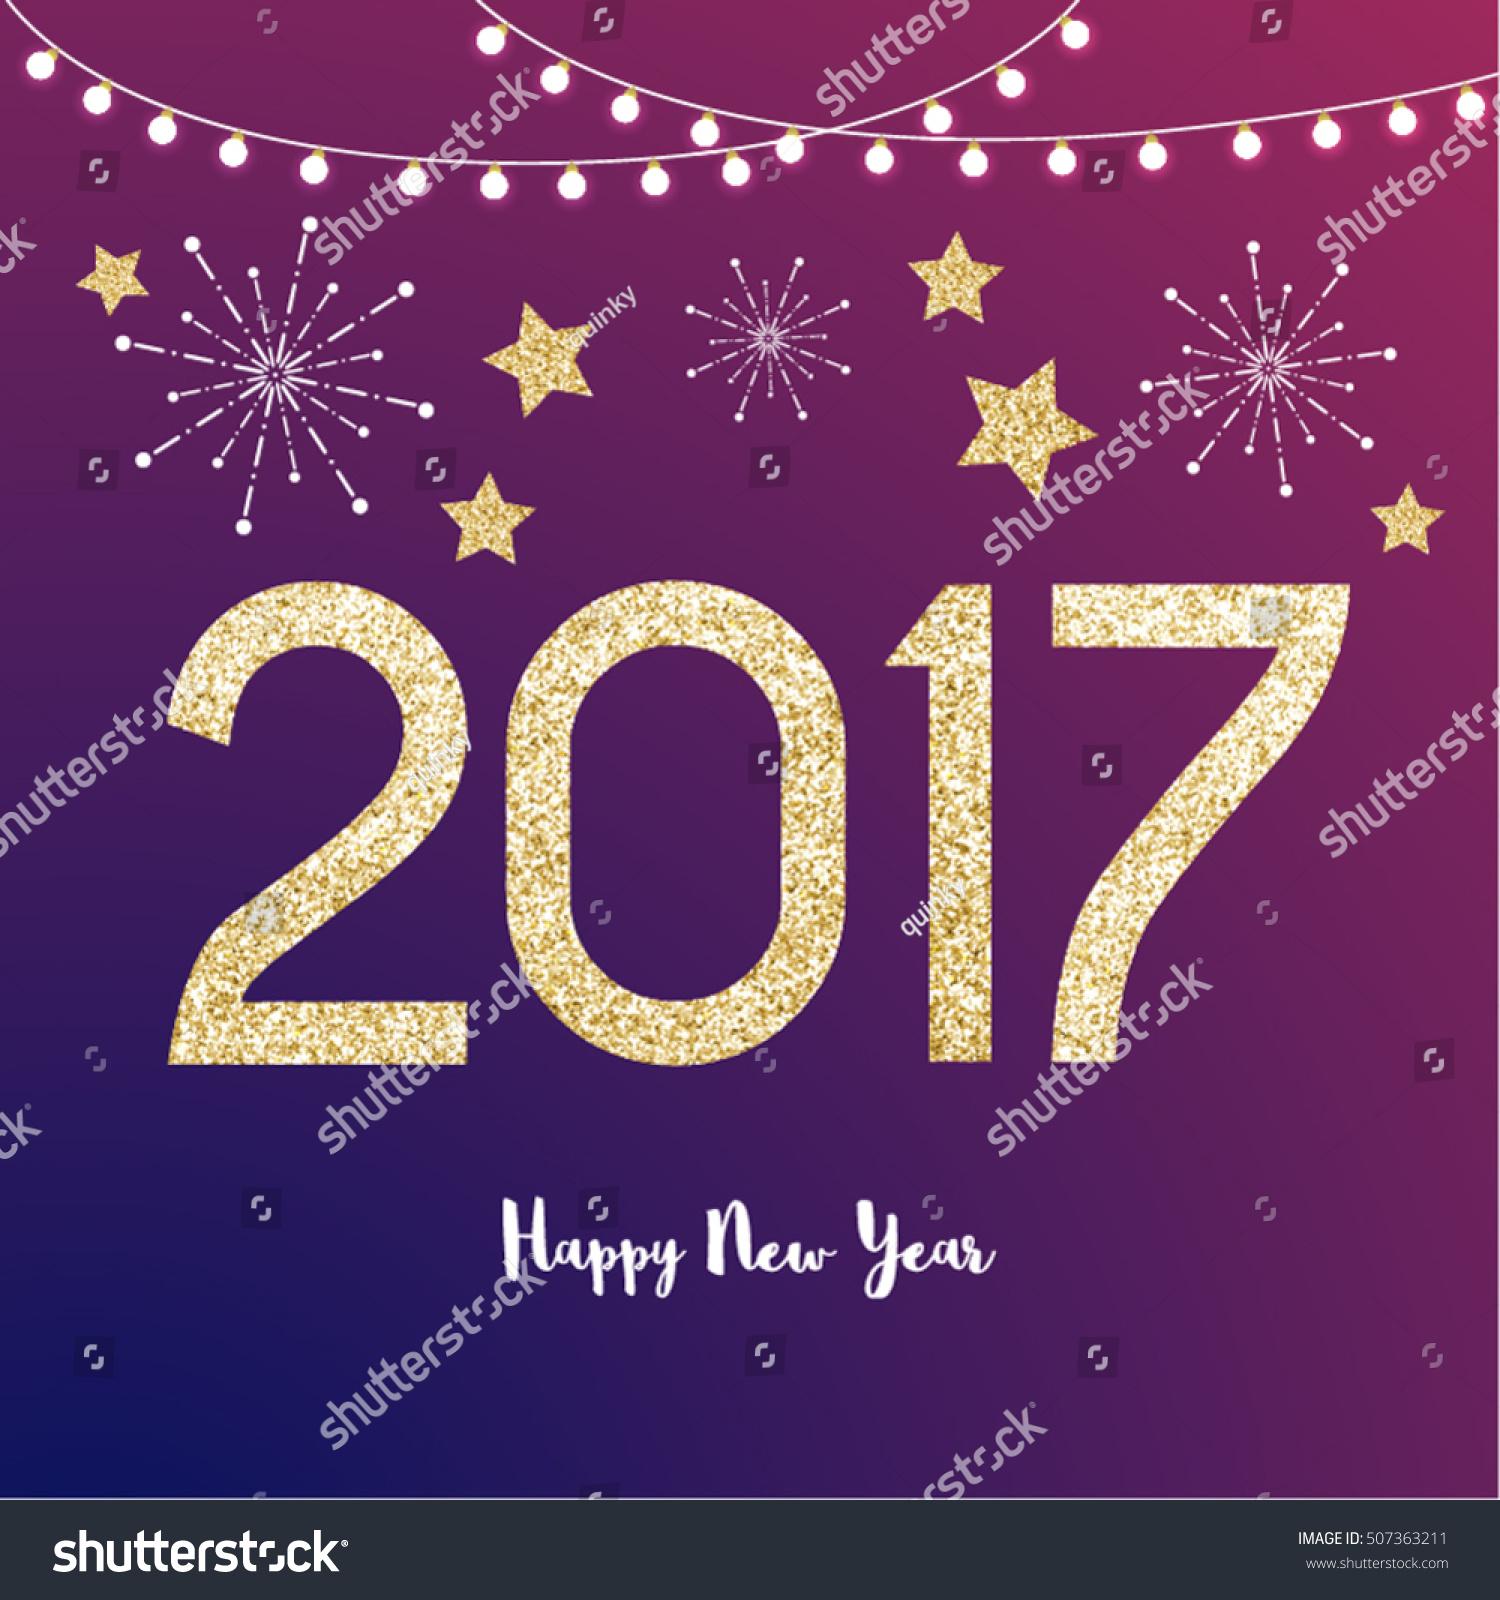 Happy New Year 2017 Gold Season Greetings Vector Design Ez Canvas